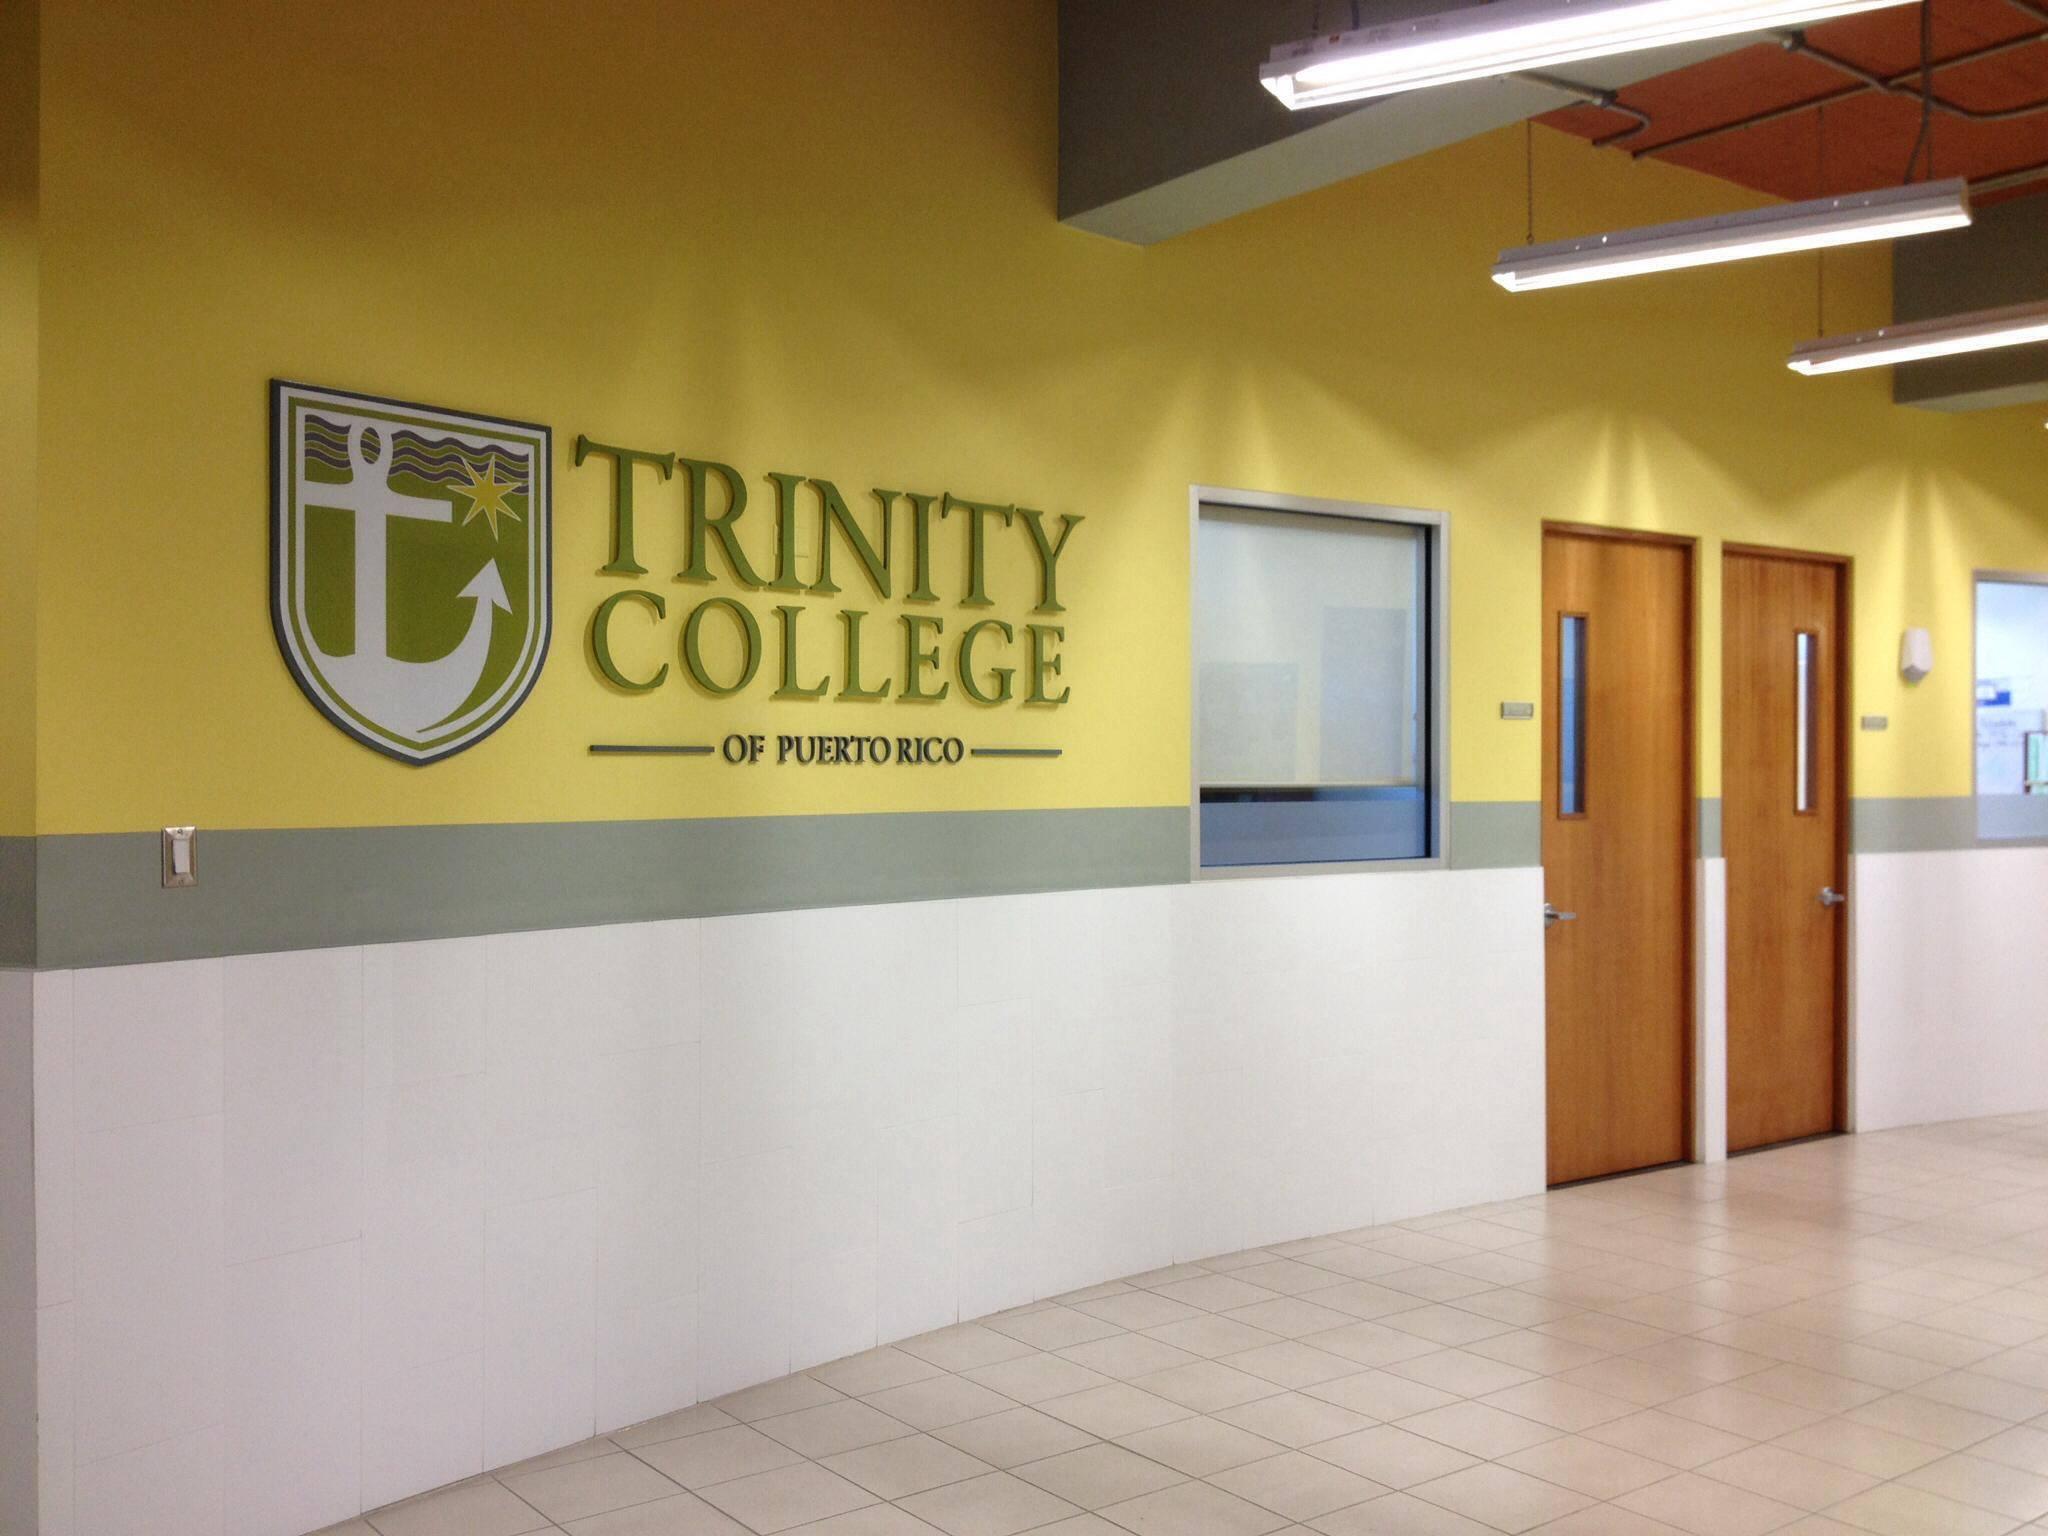 Trinity College of Puerto Rico signage.